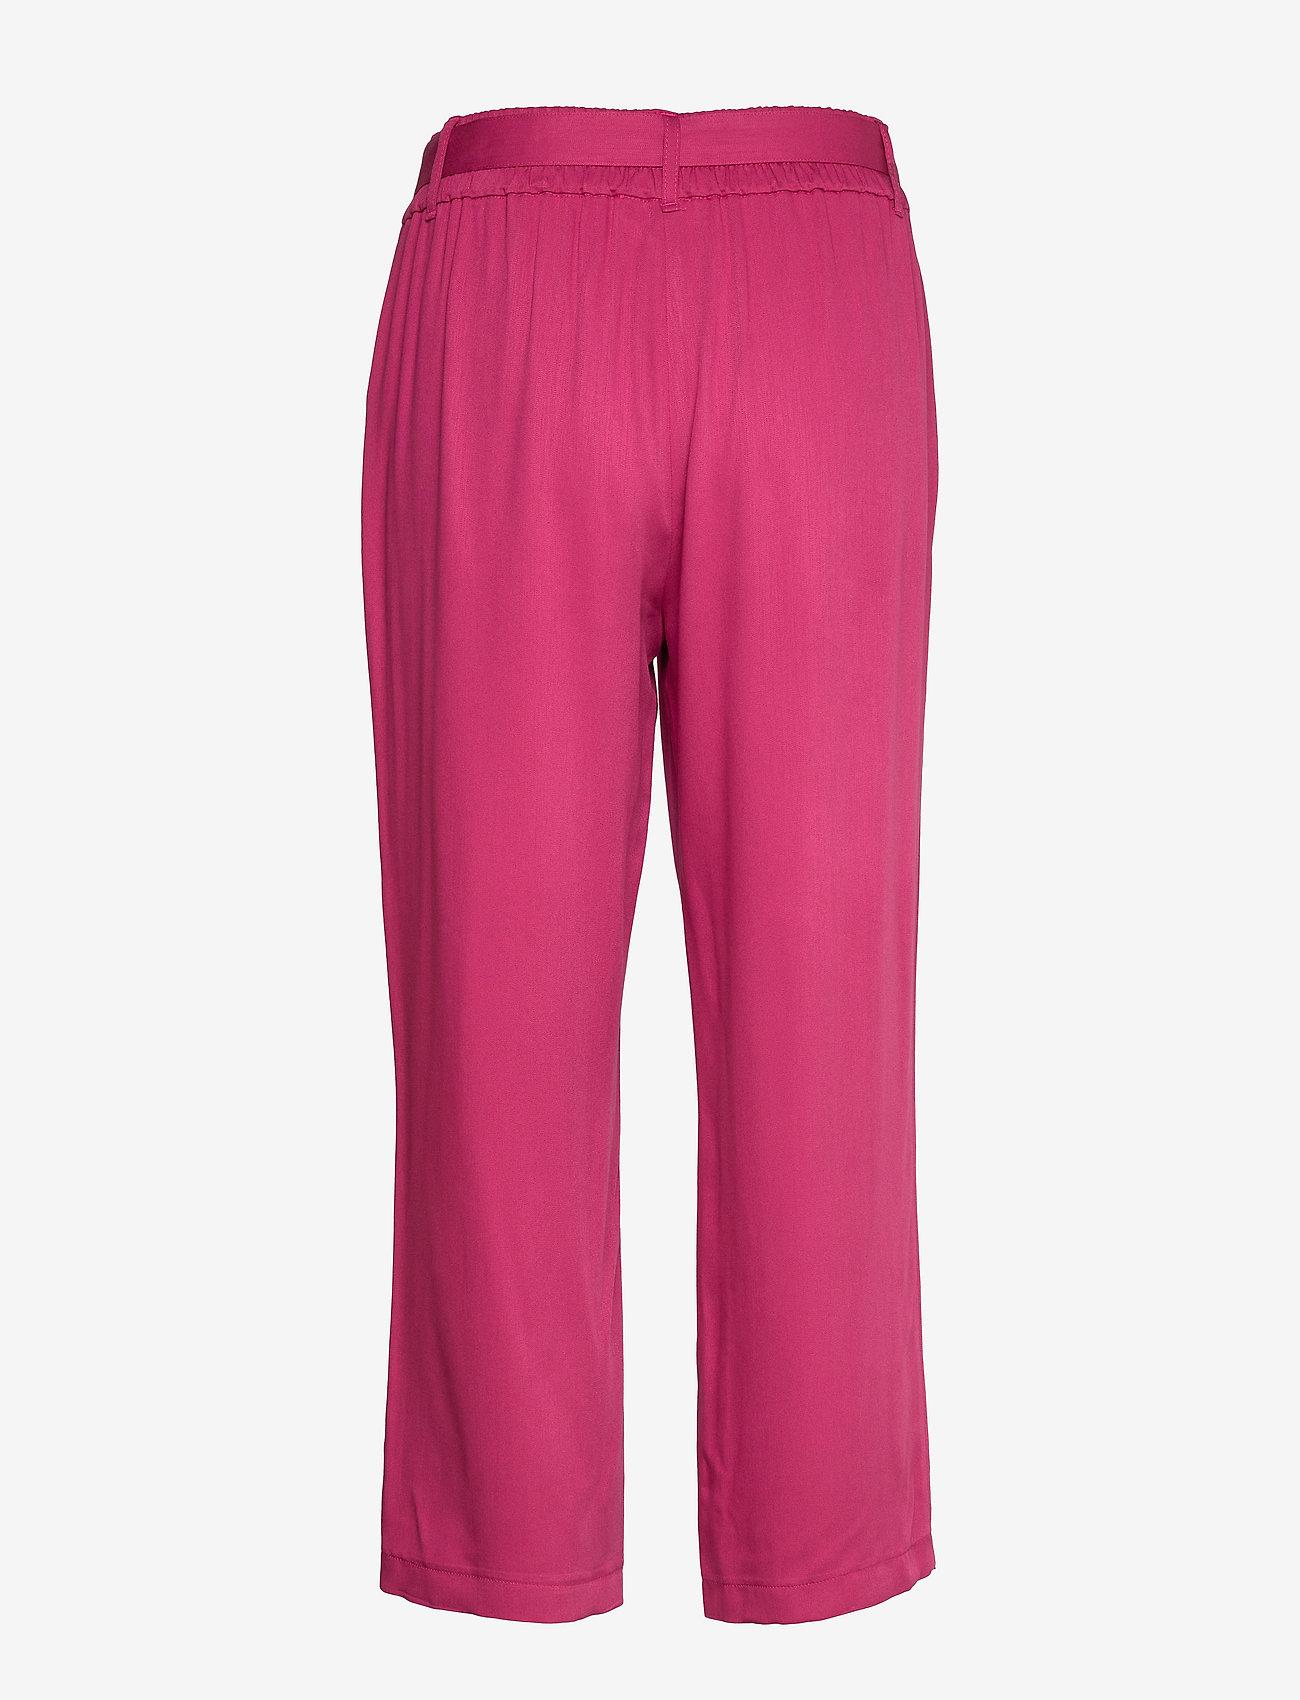 Gerry Weber Edition CROP LEISURE TROUSER- Pantalons 9bxRhslq XZIPG iwOD8U8S